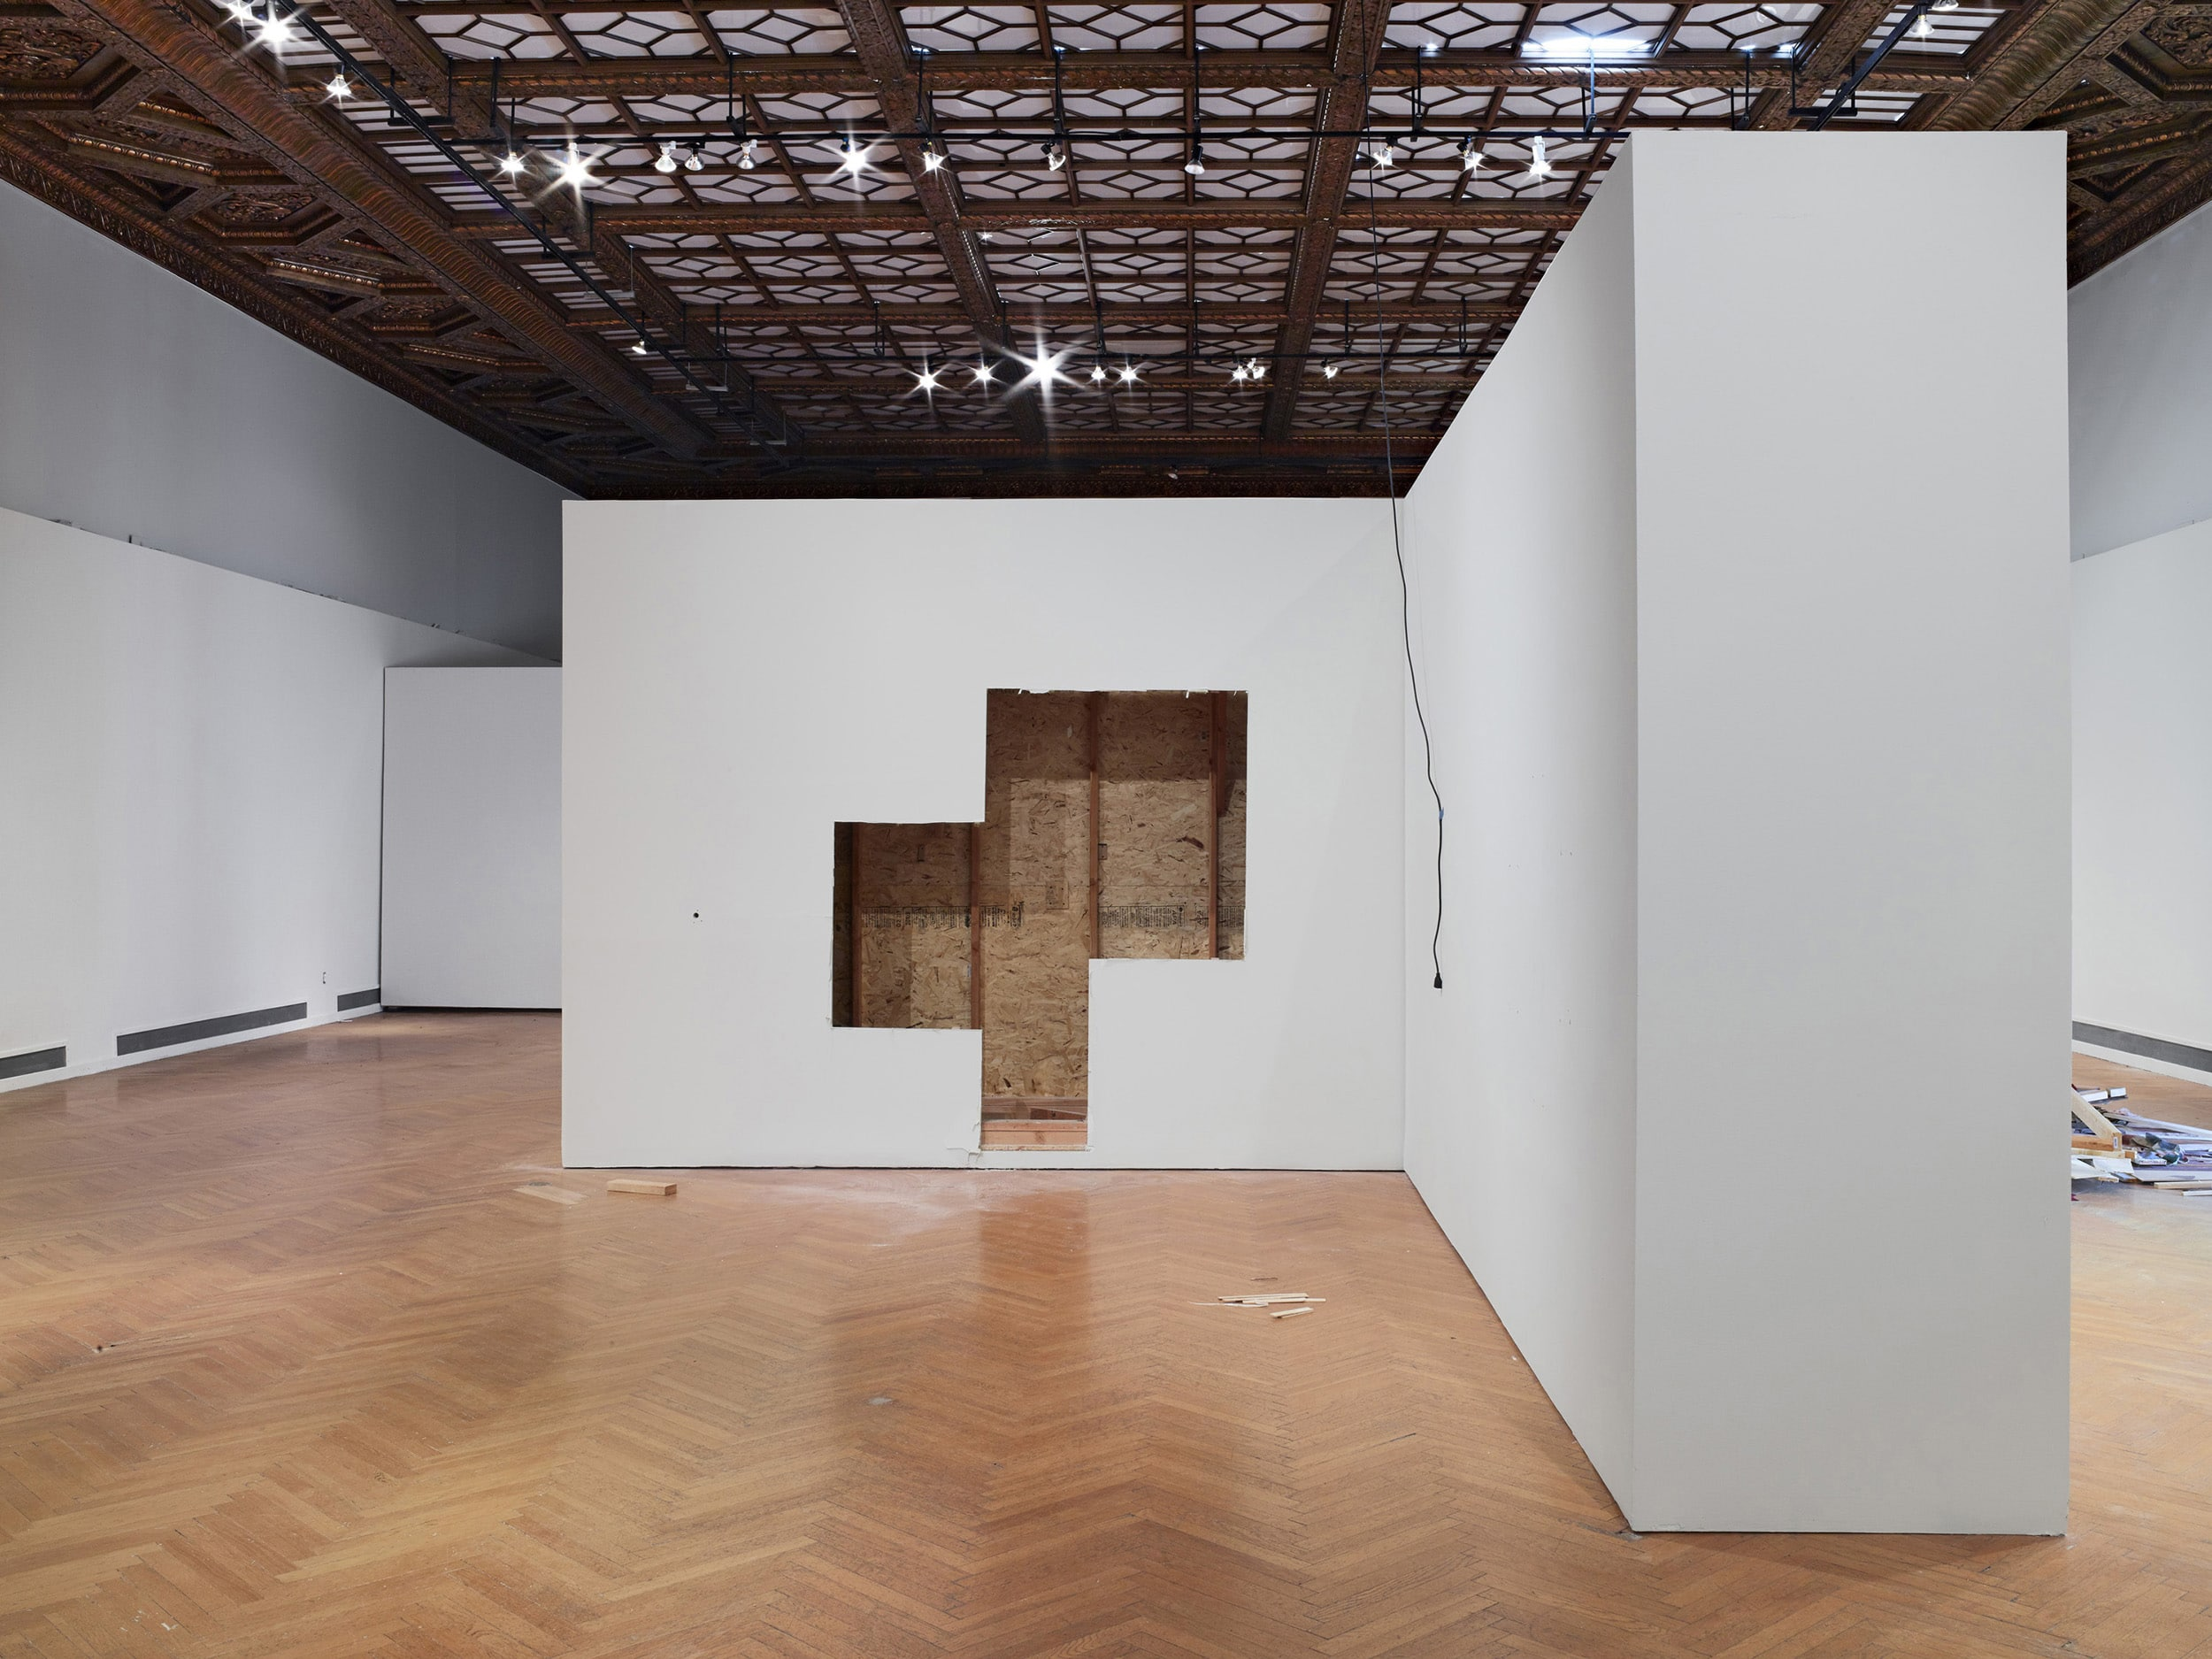 Intervention I MCAM, 2018, 37.5×50